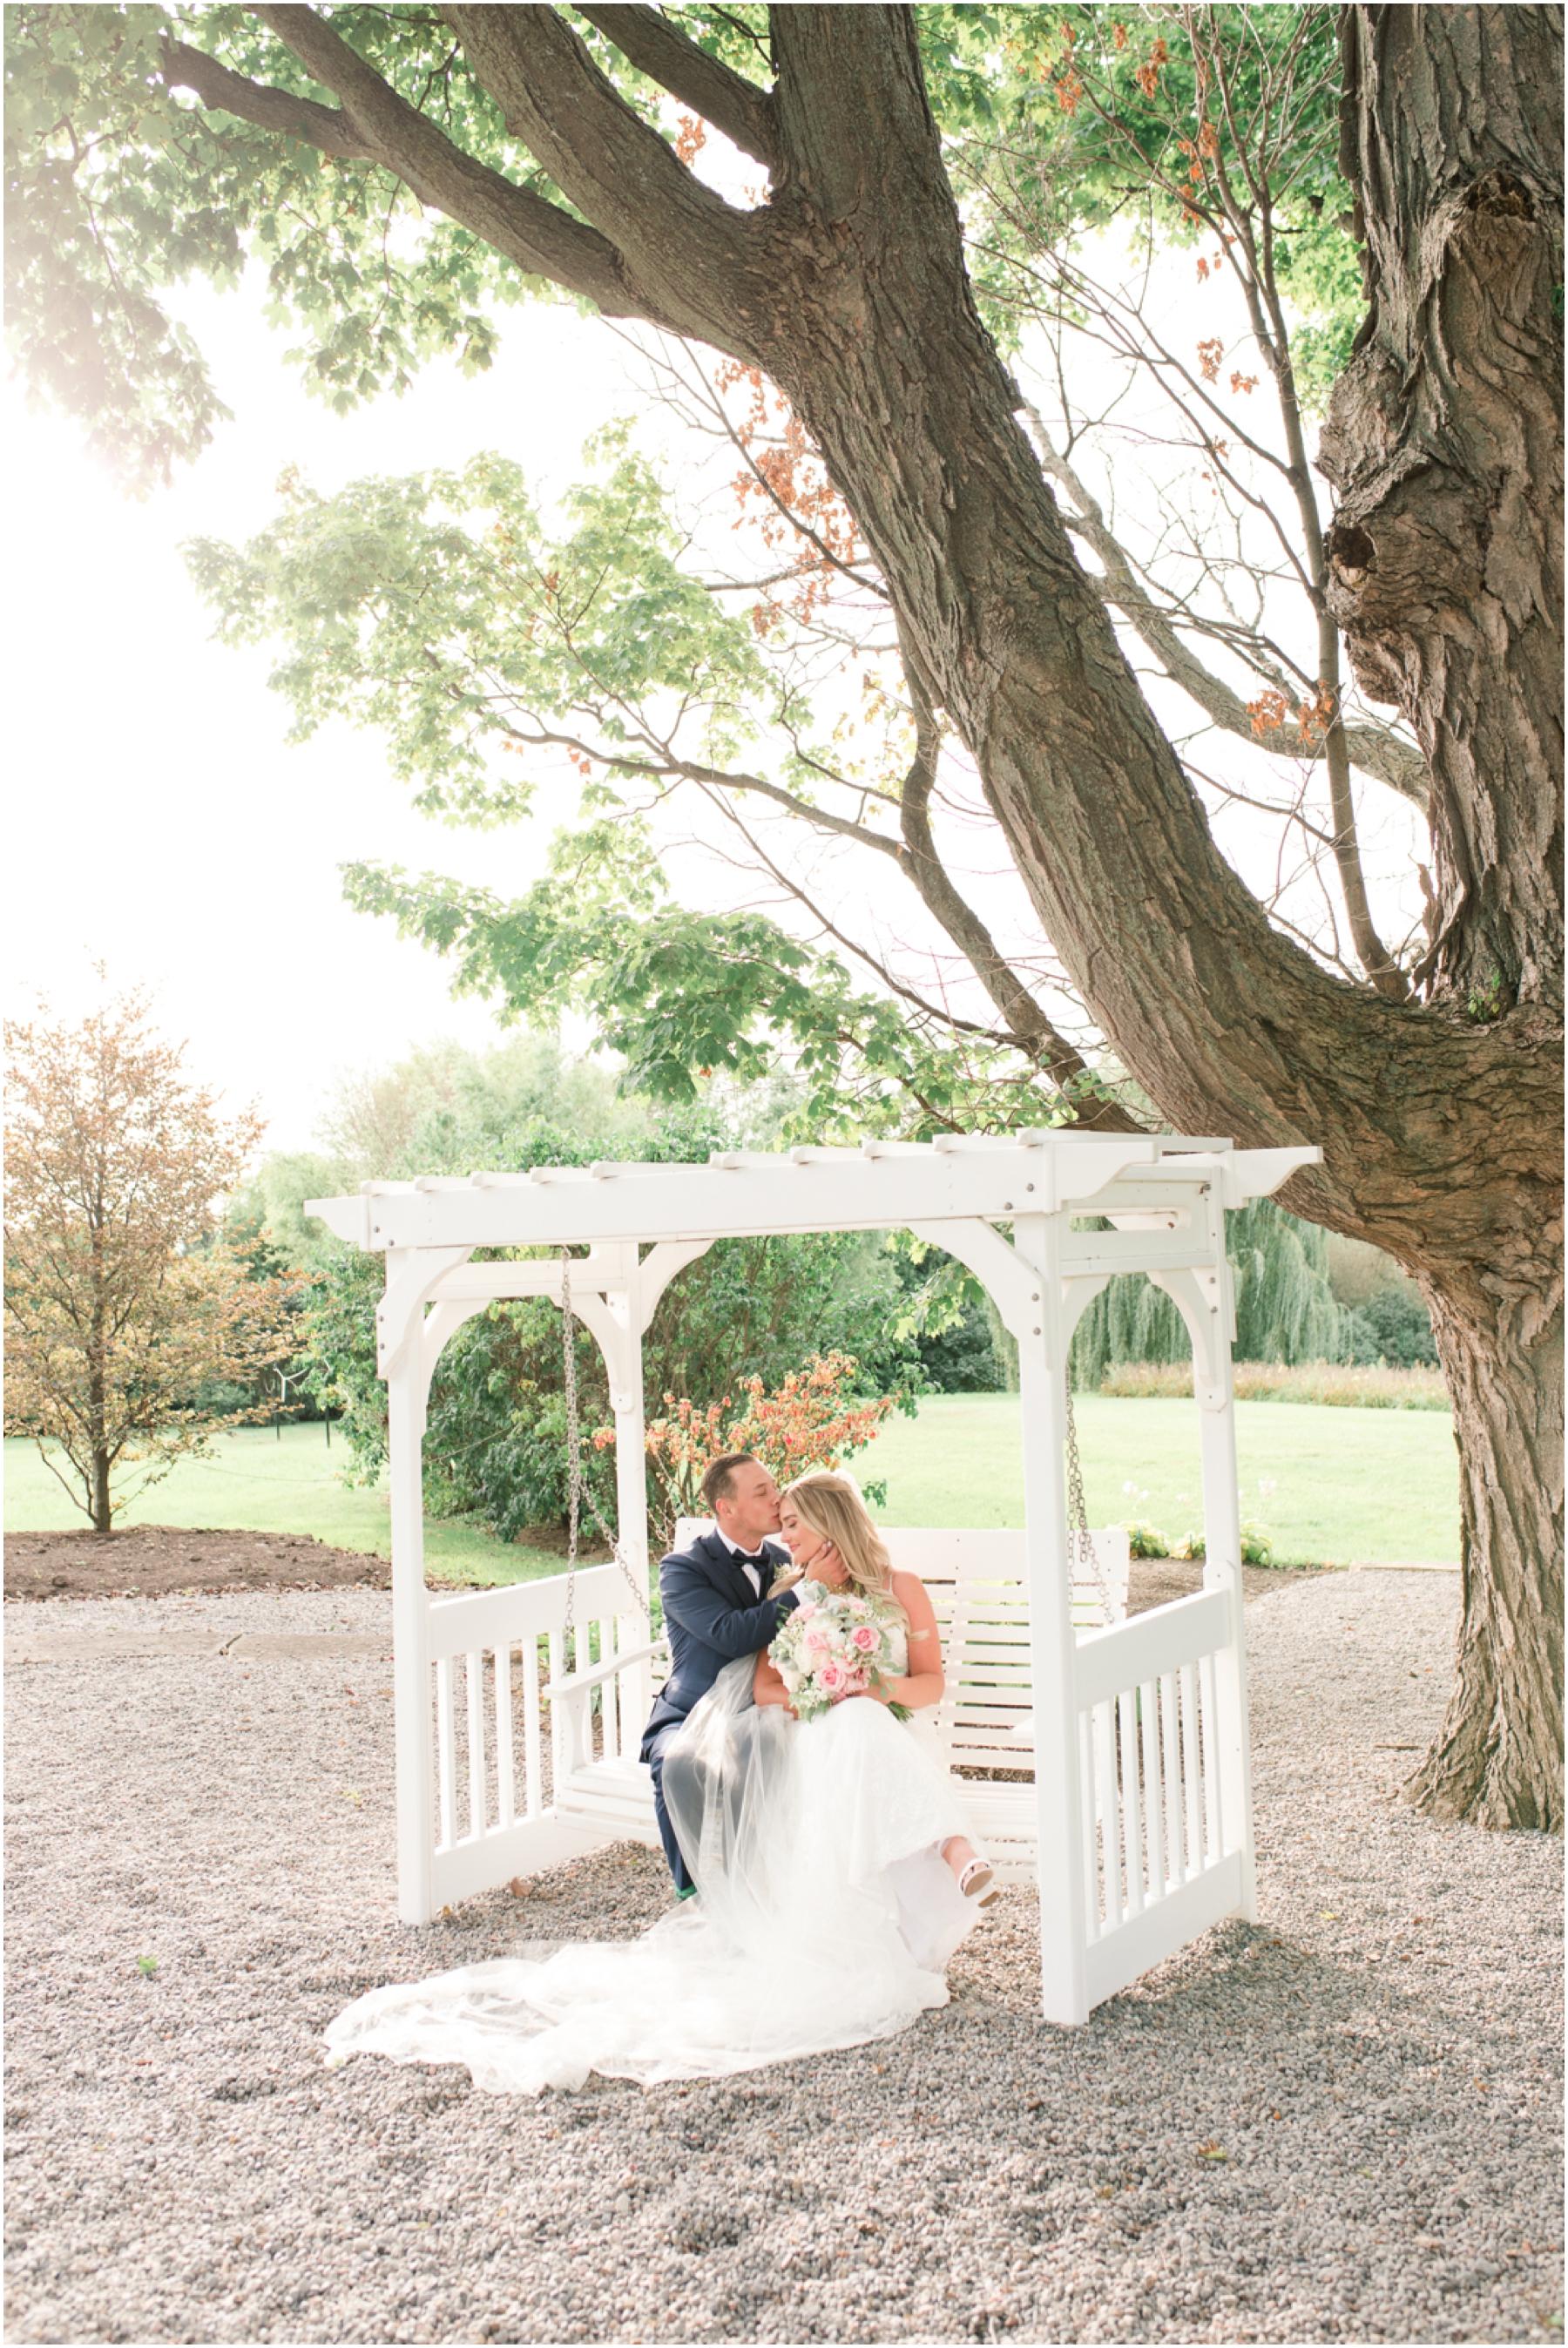 Bloom Field Gardens Wedding Precious Photography Katherine & Chris_066